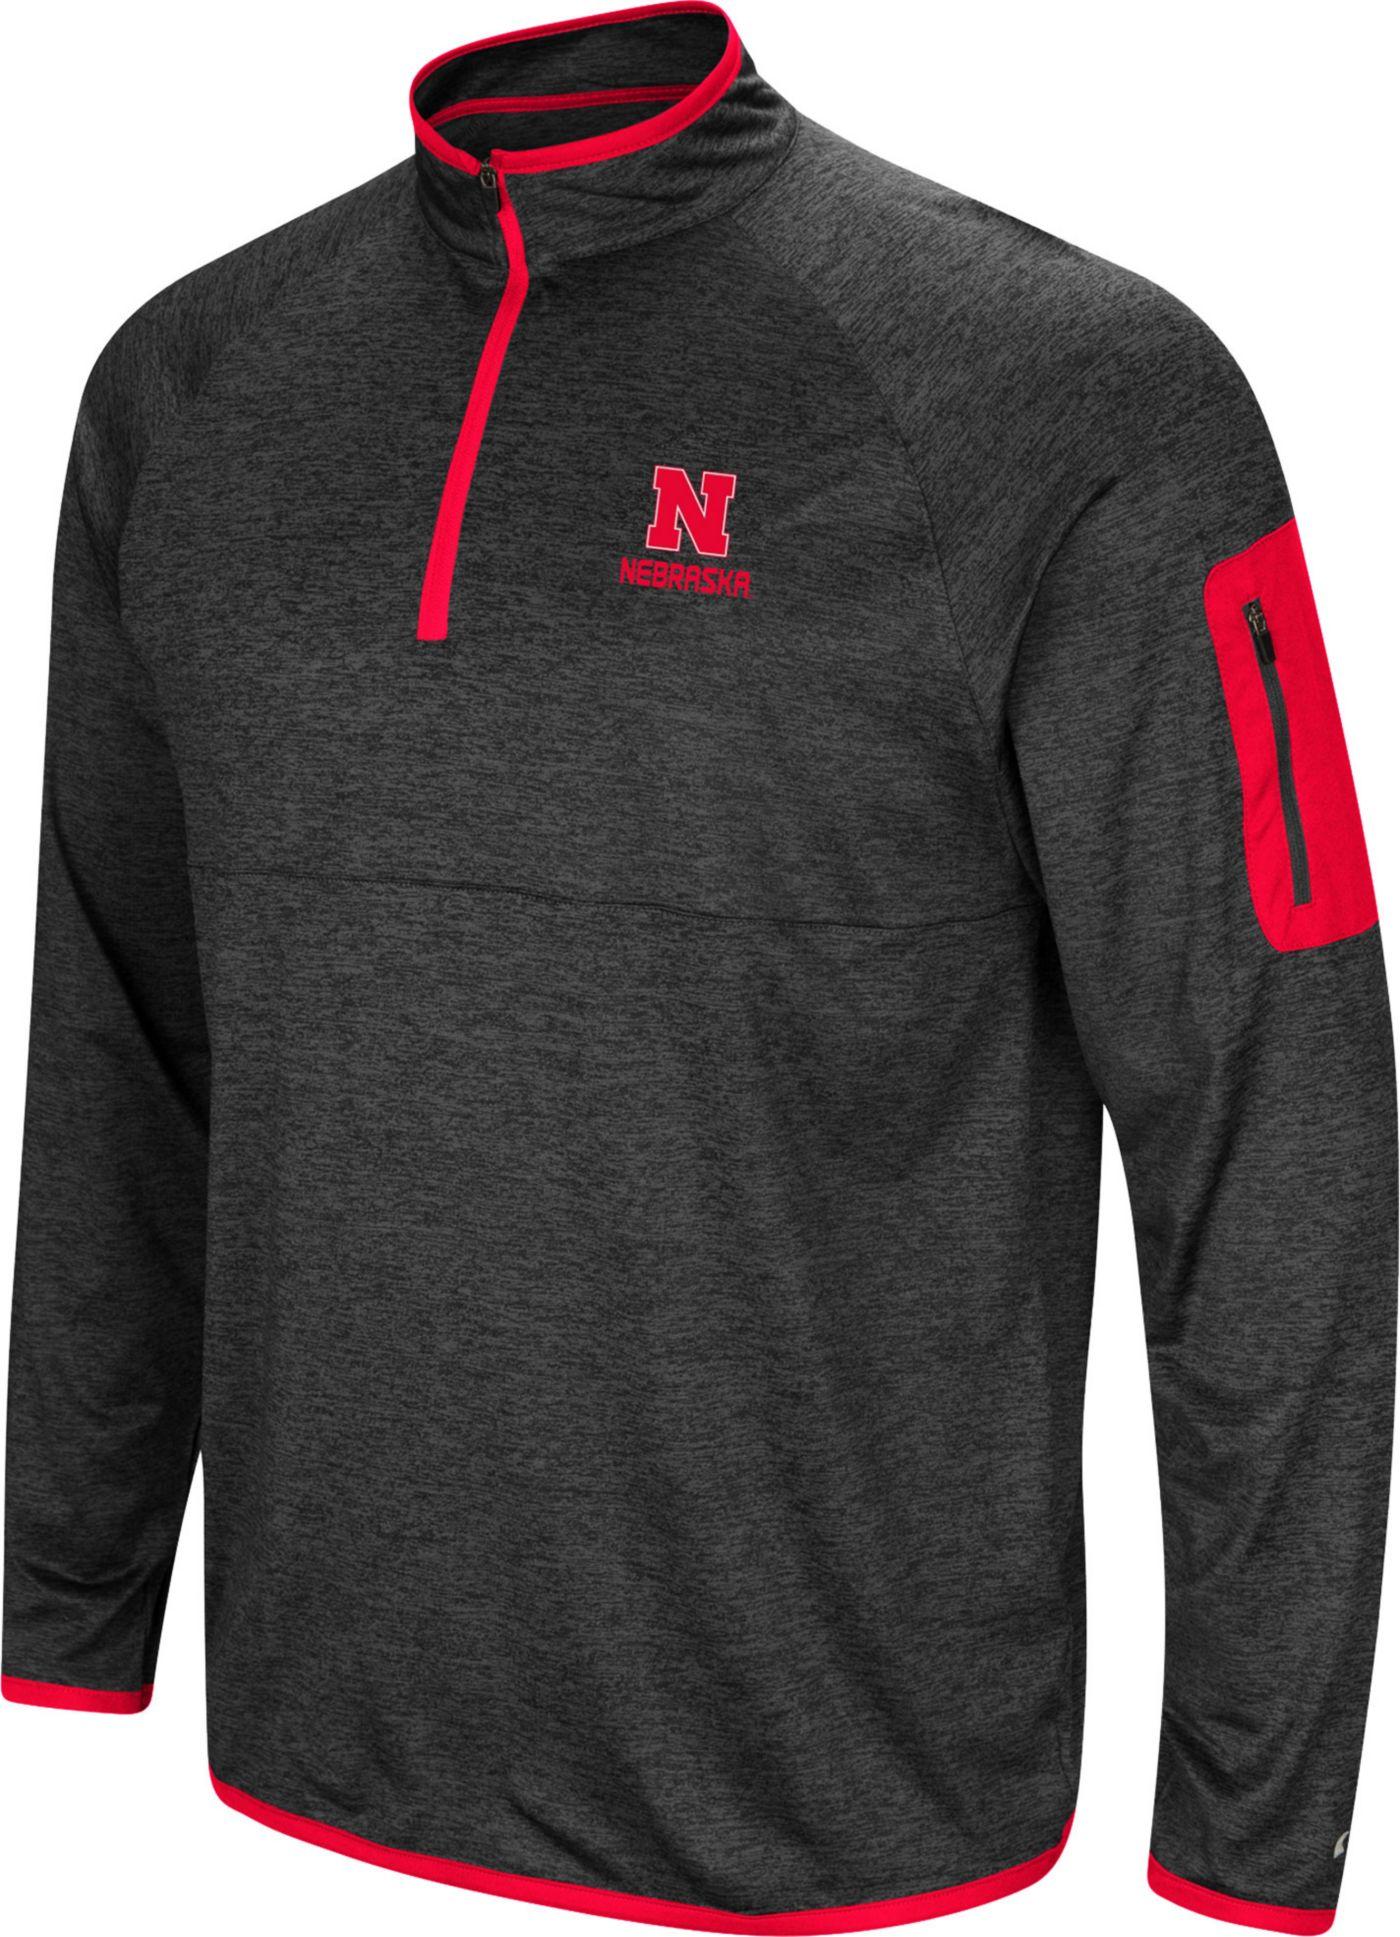 Colosseum Men's Nebraska Cornhuskers Grey Indus River Quarter-Zip Shirt